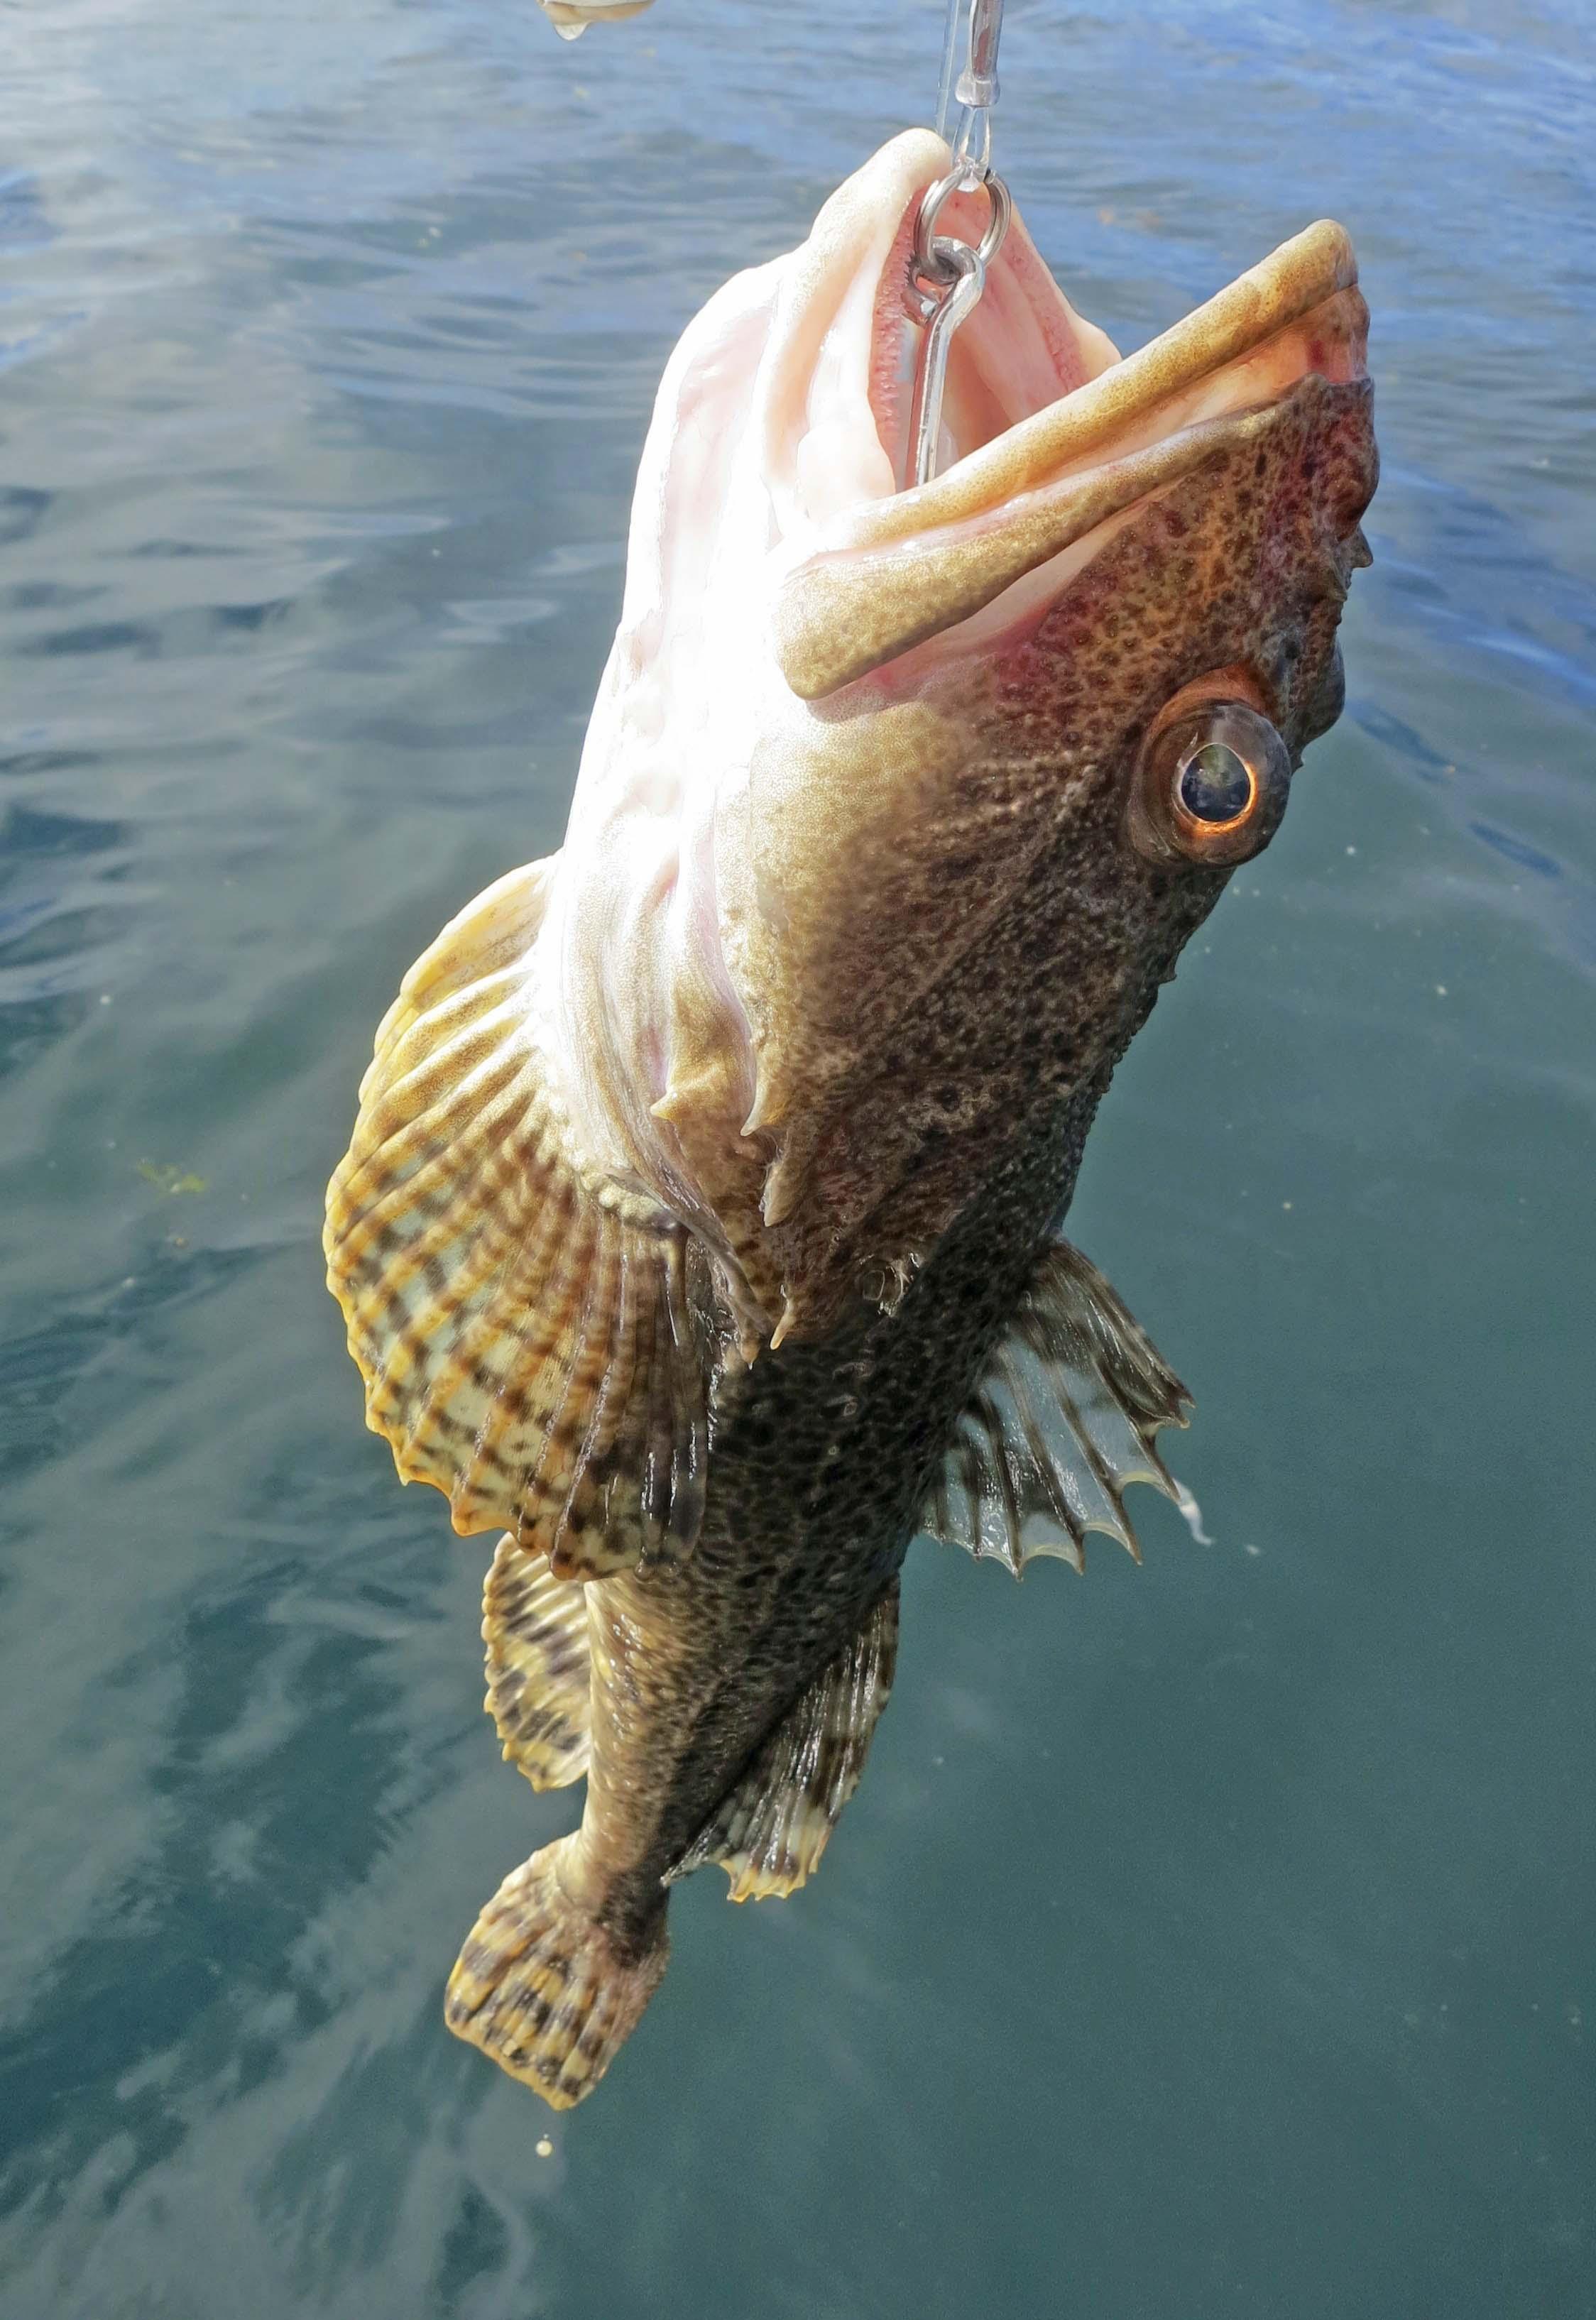 Rockfish caught by Cammie Lumpkin off Kodiak Island.